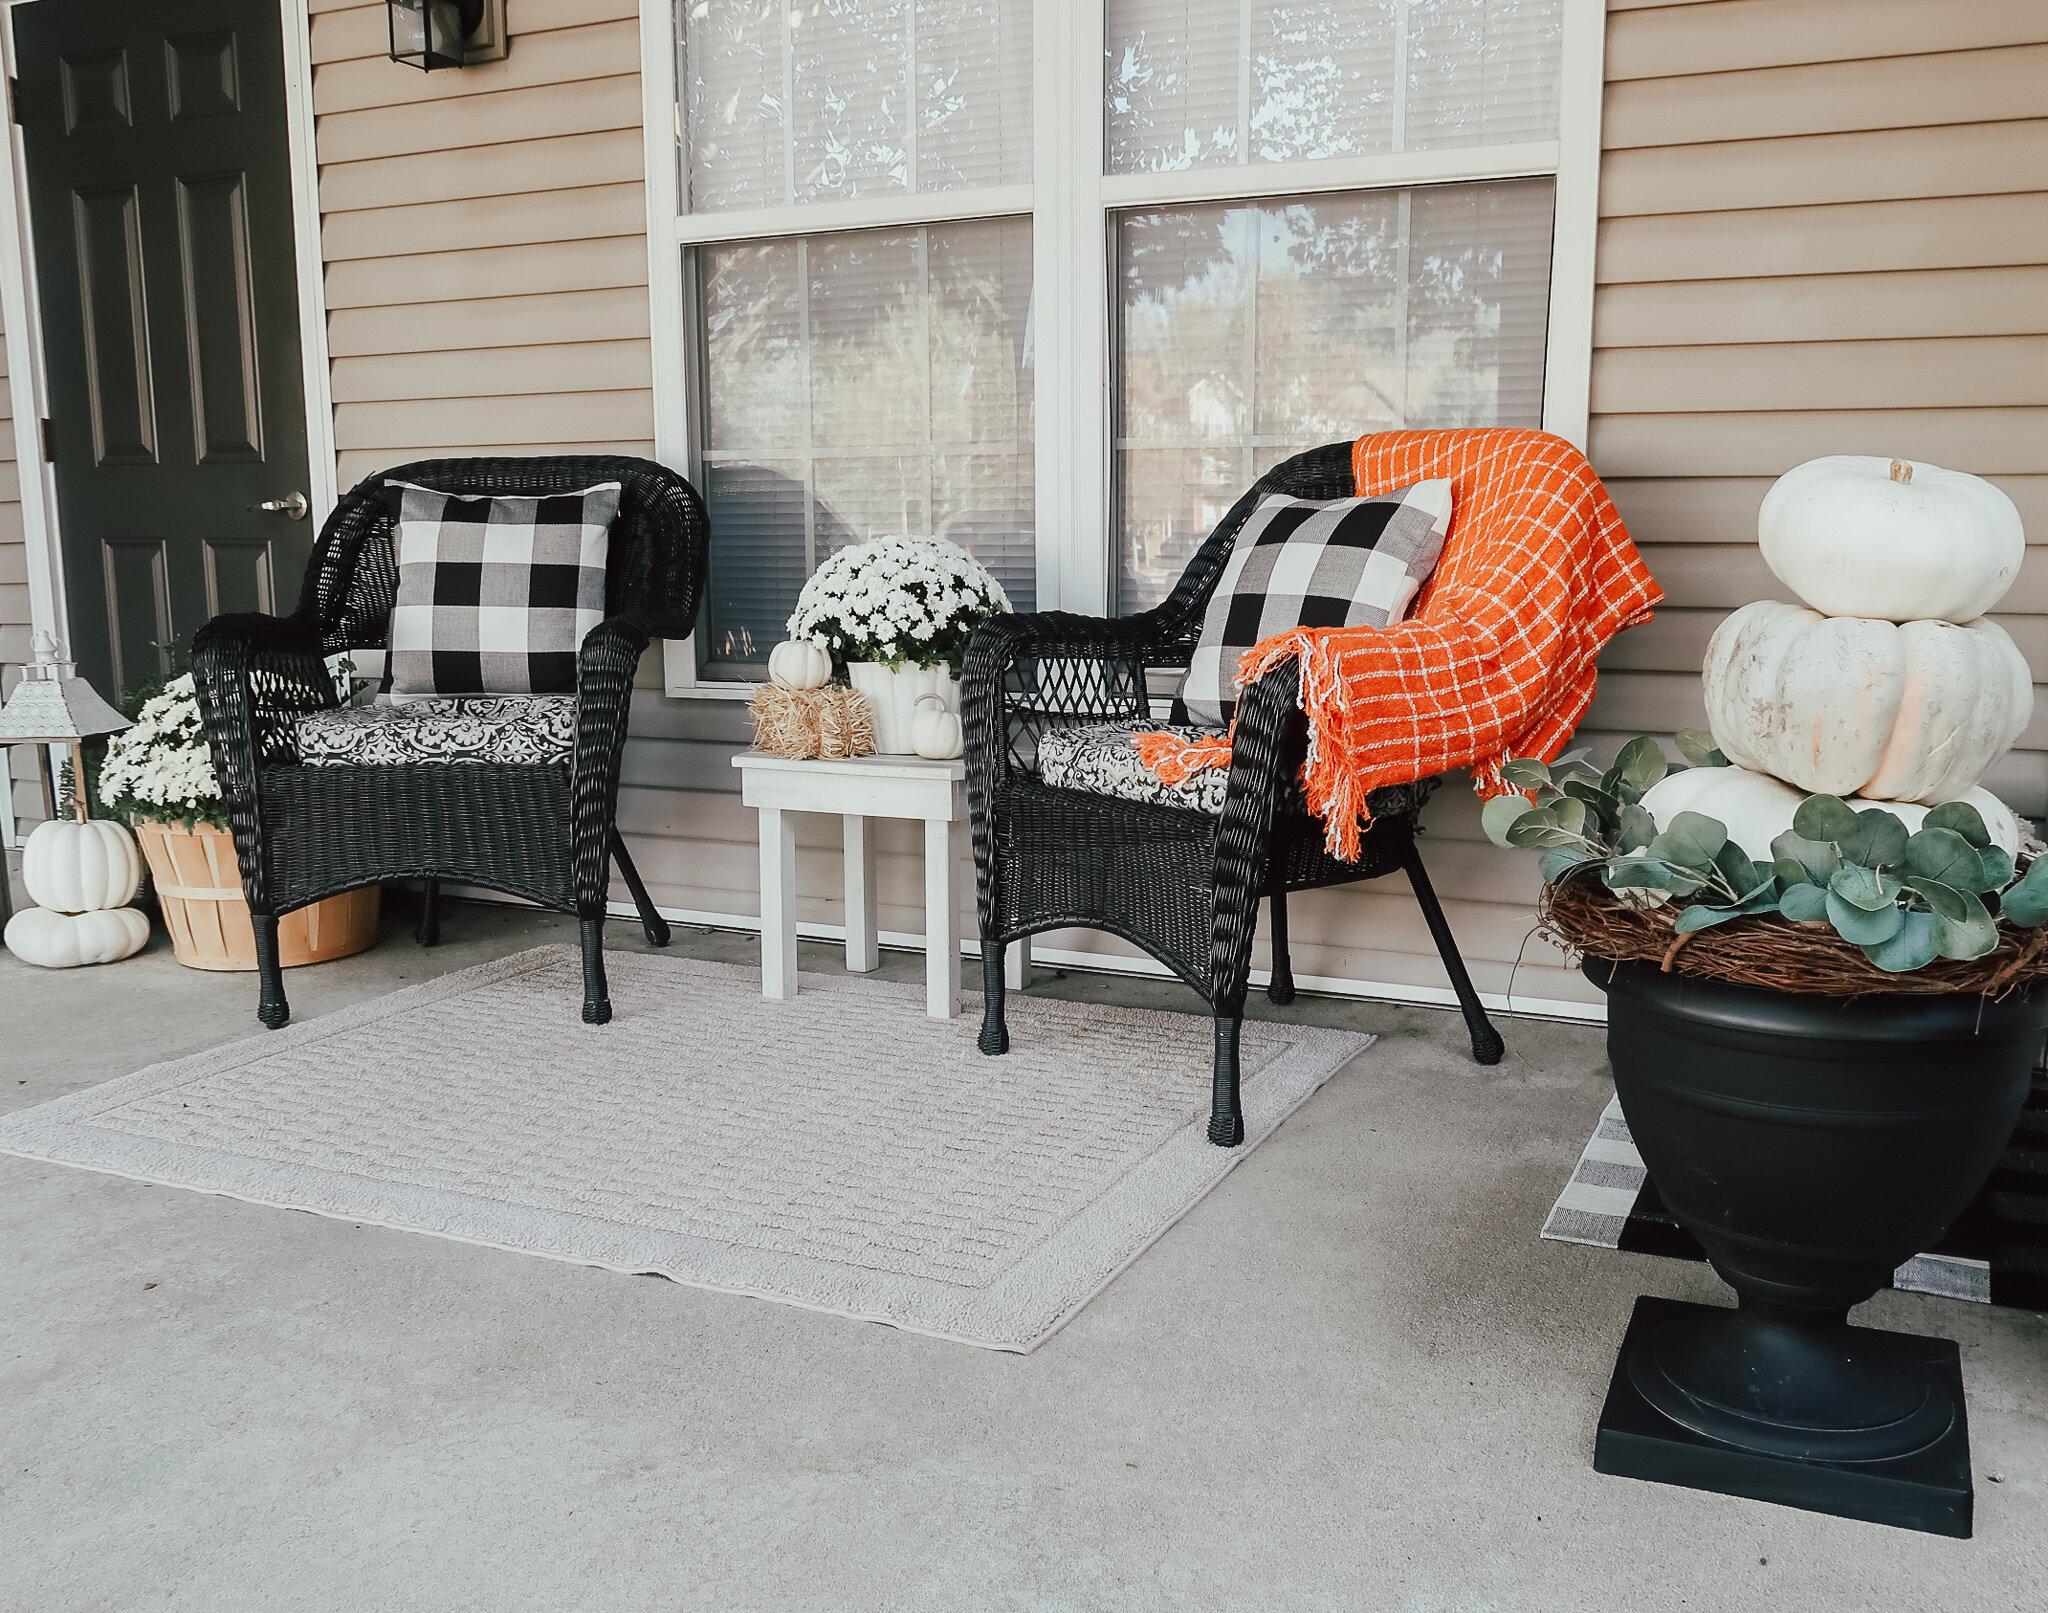 fall-front-porch-decor-3.jpg